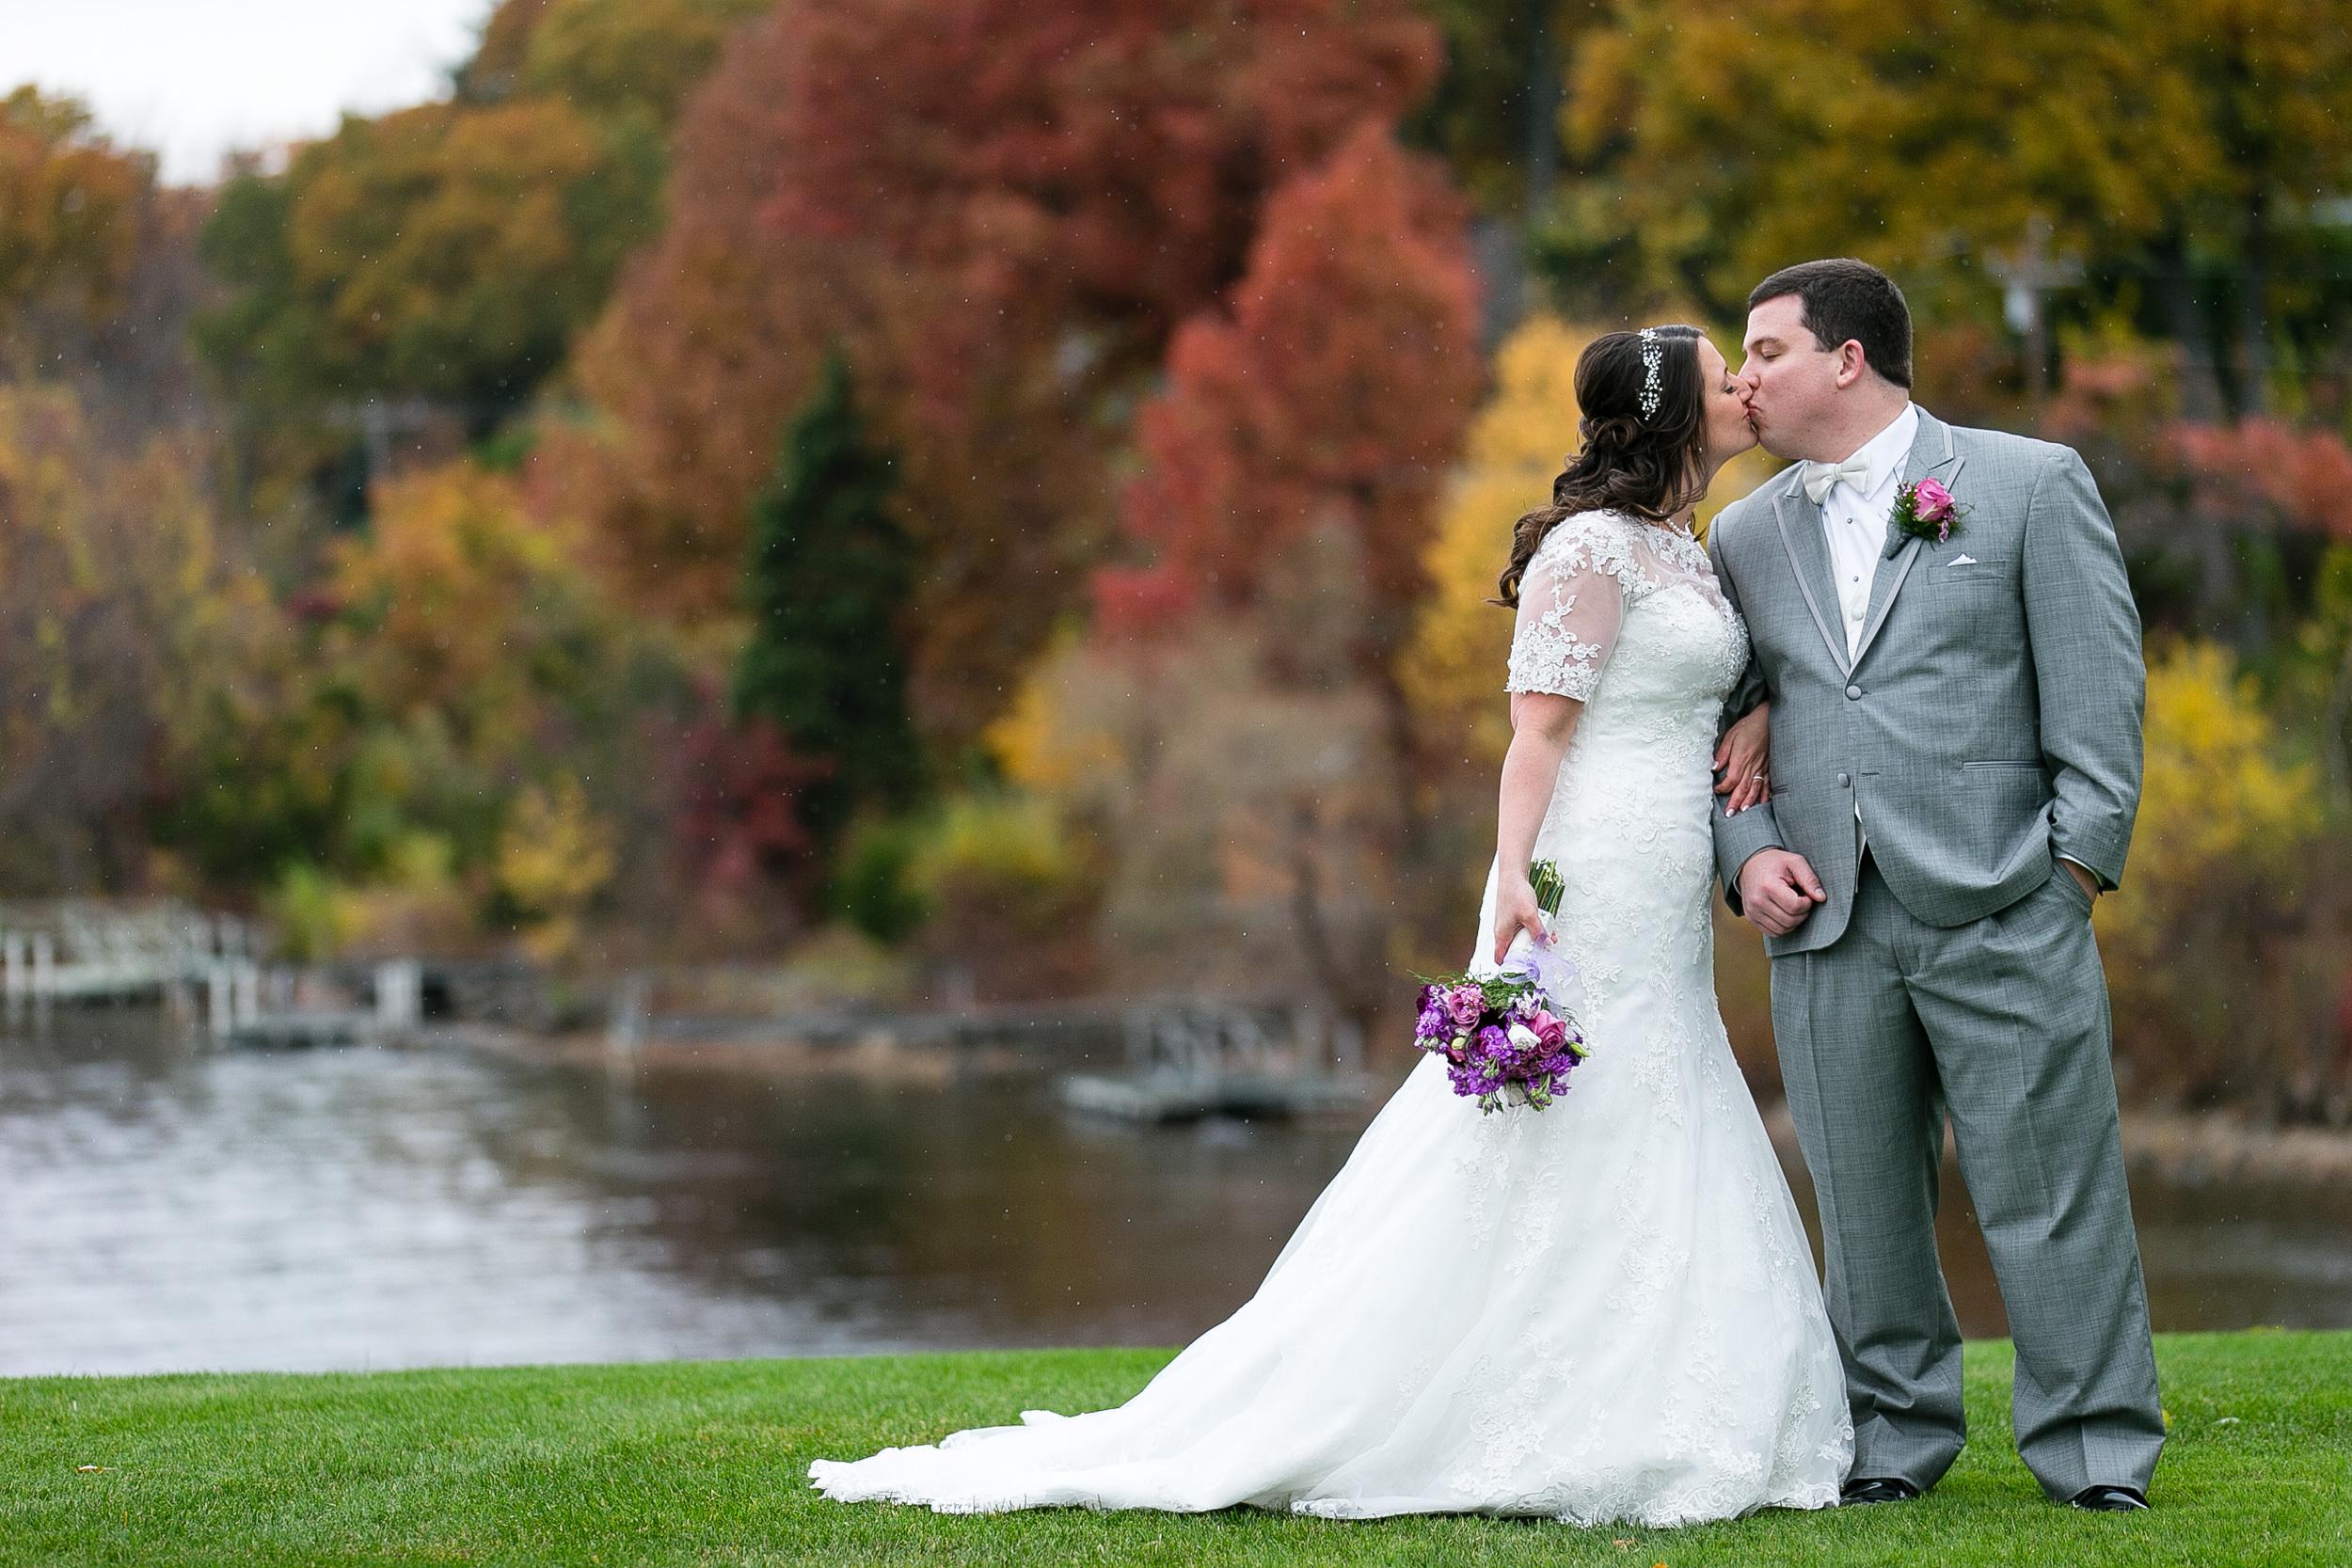 Connecticut-Fall-Wedding-Candlewood-Inn-CT-Documentary-Wedding-Photographer-Jacek-Dolata-111-6.jpg